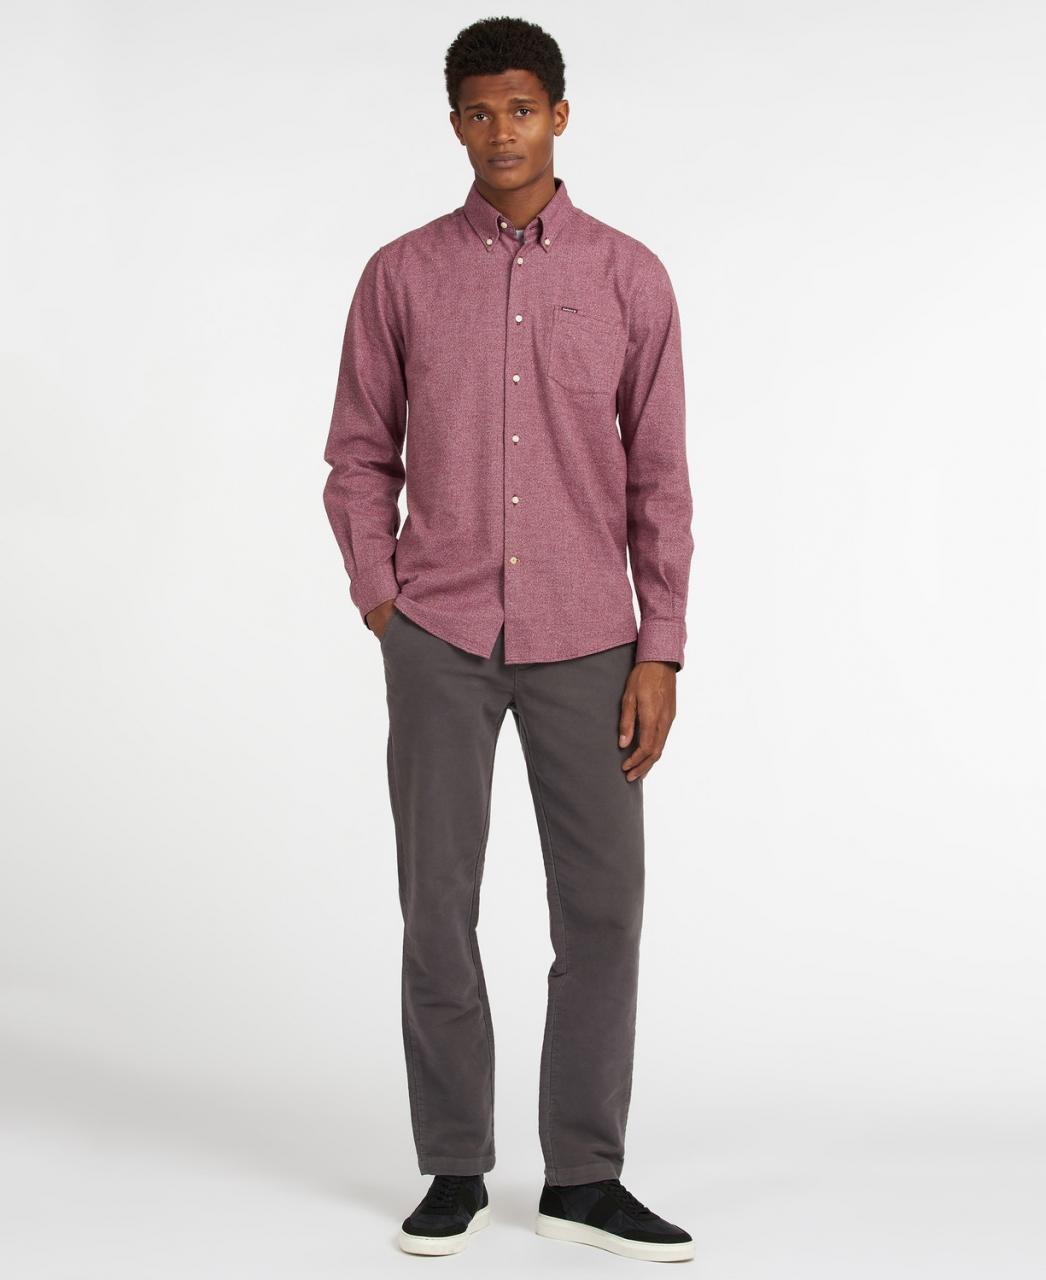 Barbour Priestcliffe Tailored Shirt - merlot